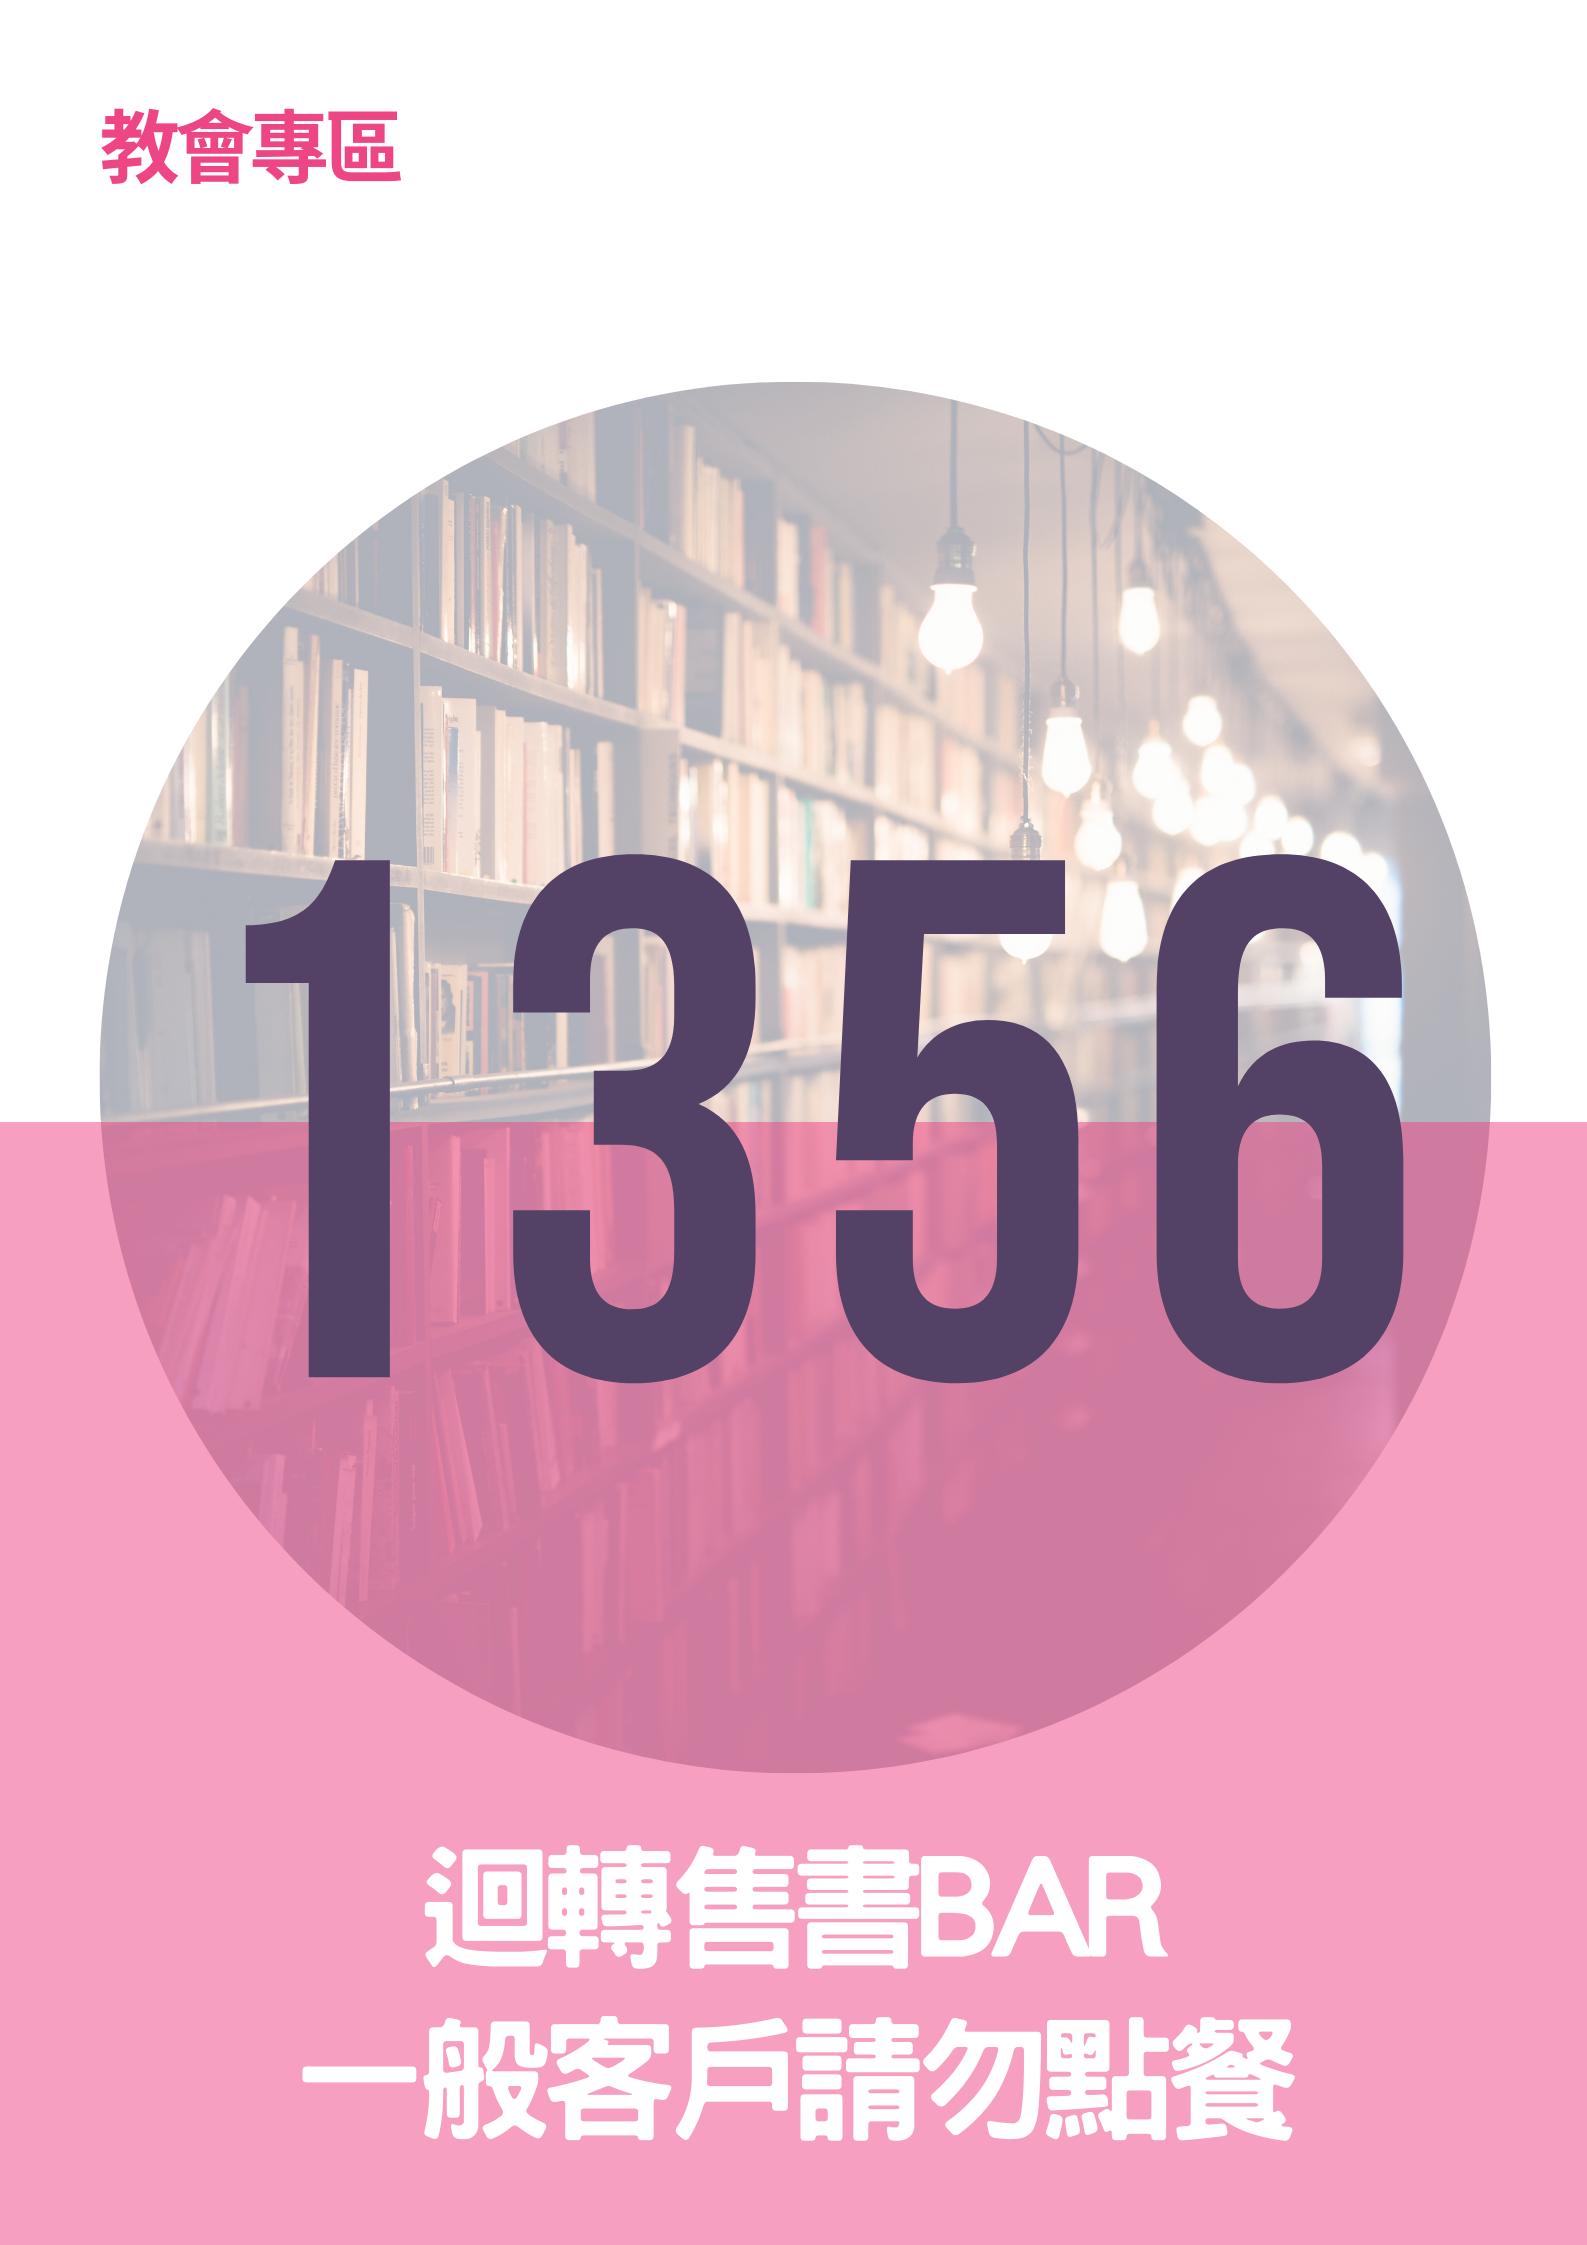 17296915